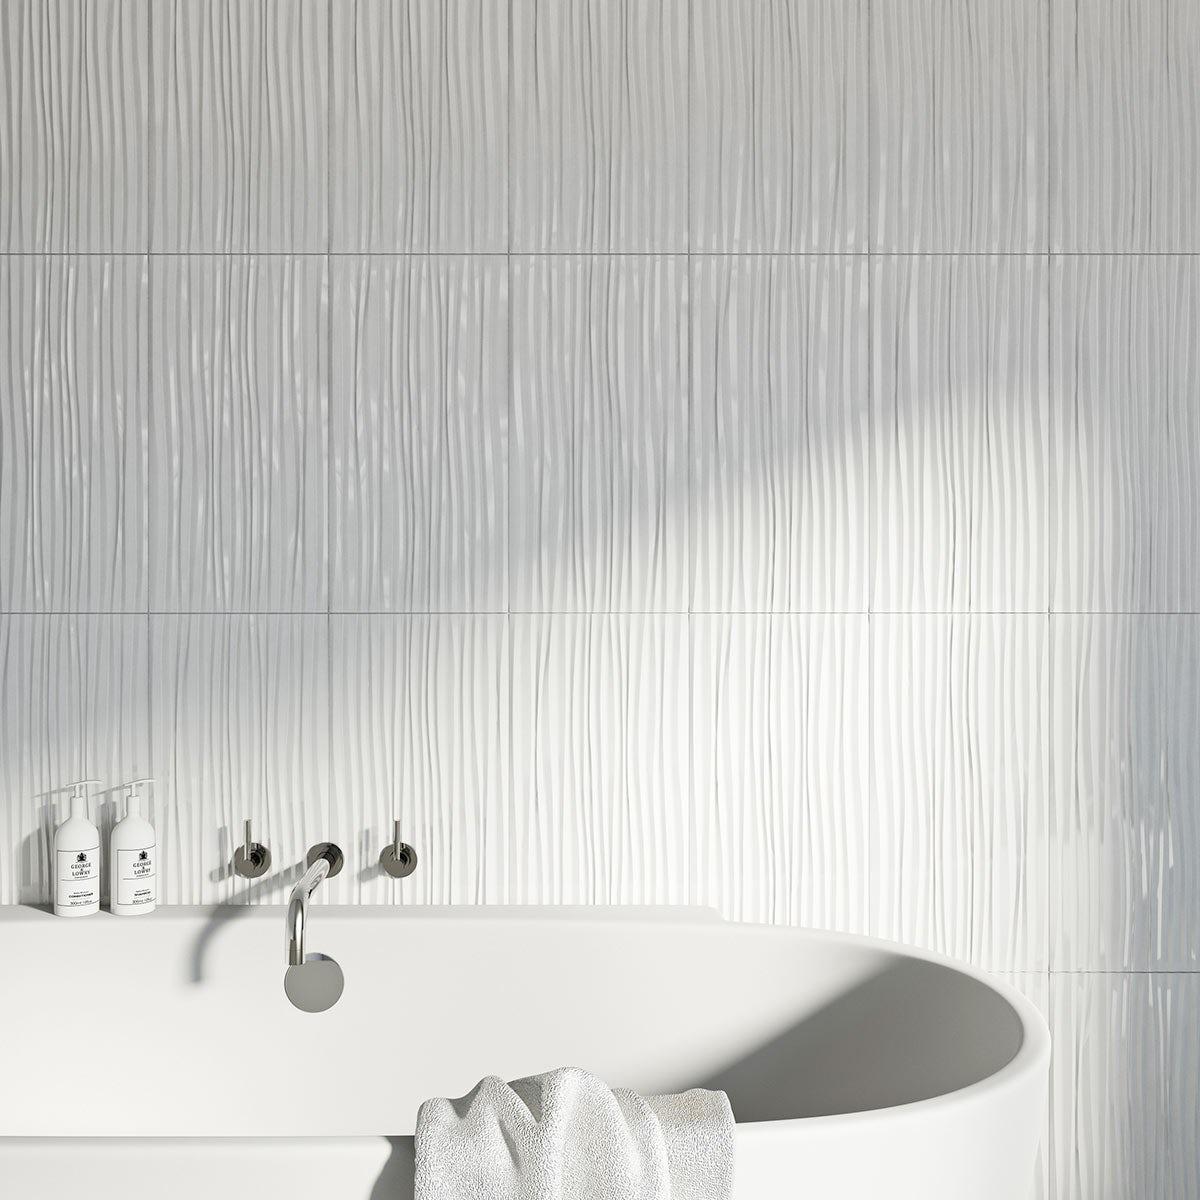 British Ceramic Tile Pure white wave gloss tile 248mm x 498mm